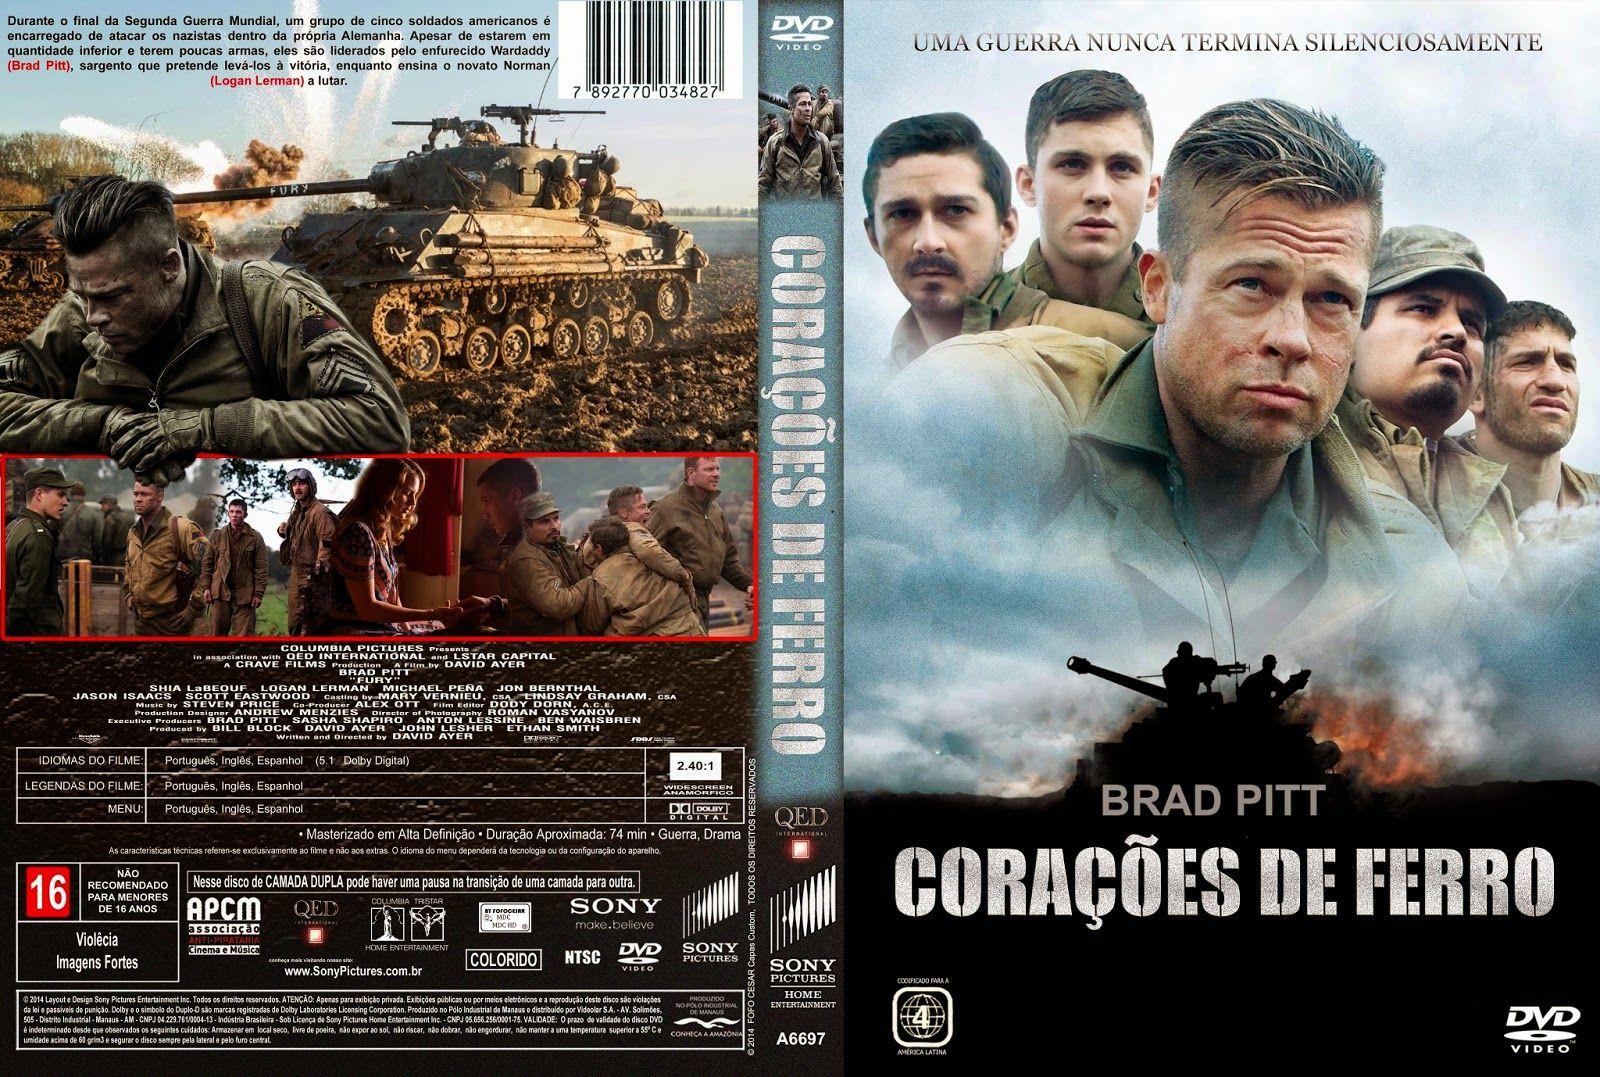 Coracoes De Ferro 2015 Filme Coracao De Ferro Filmes De Acao Filmes